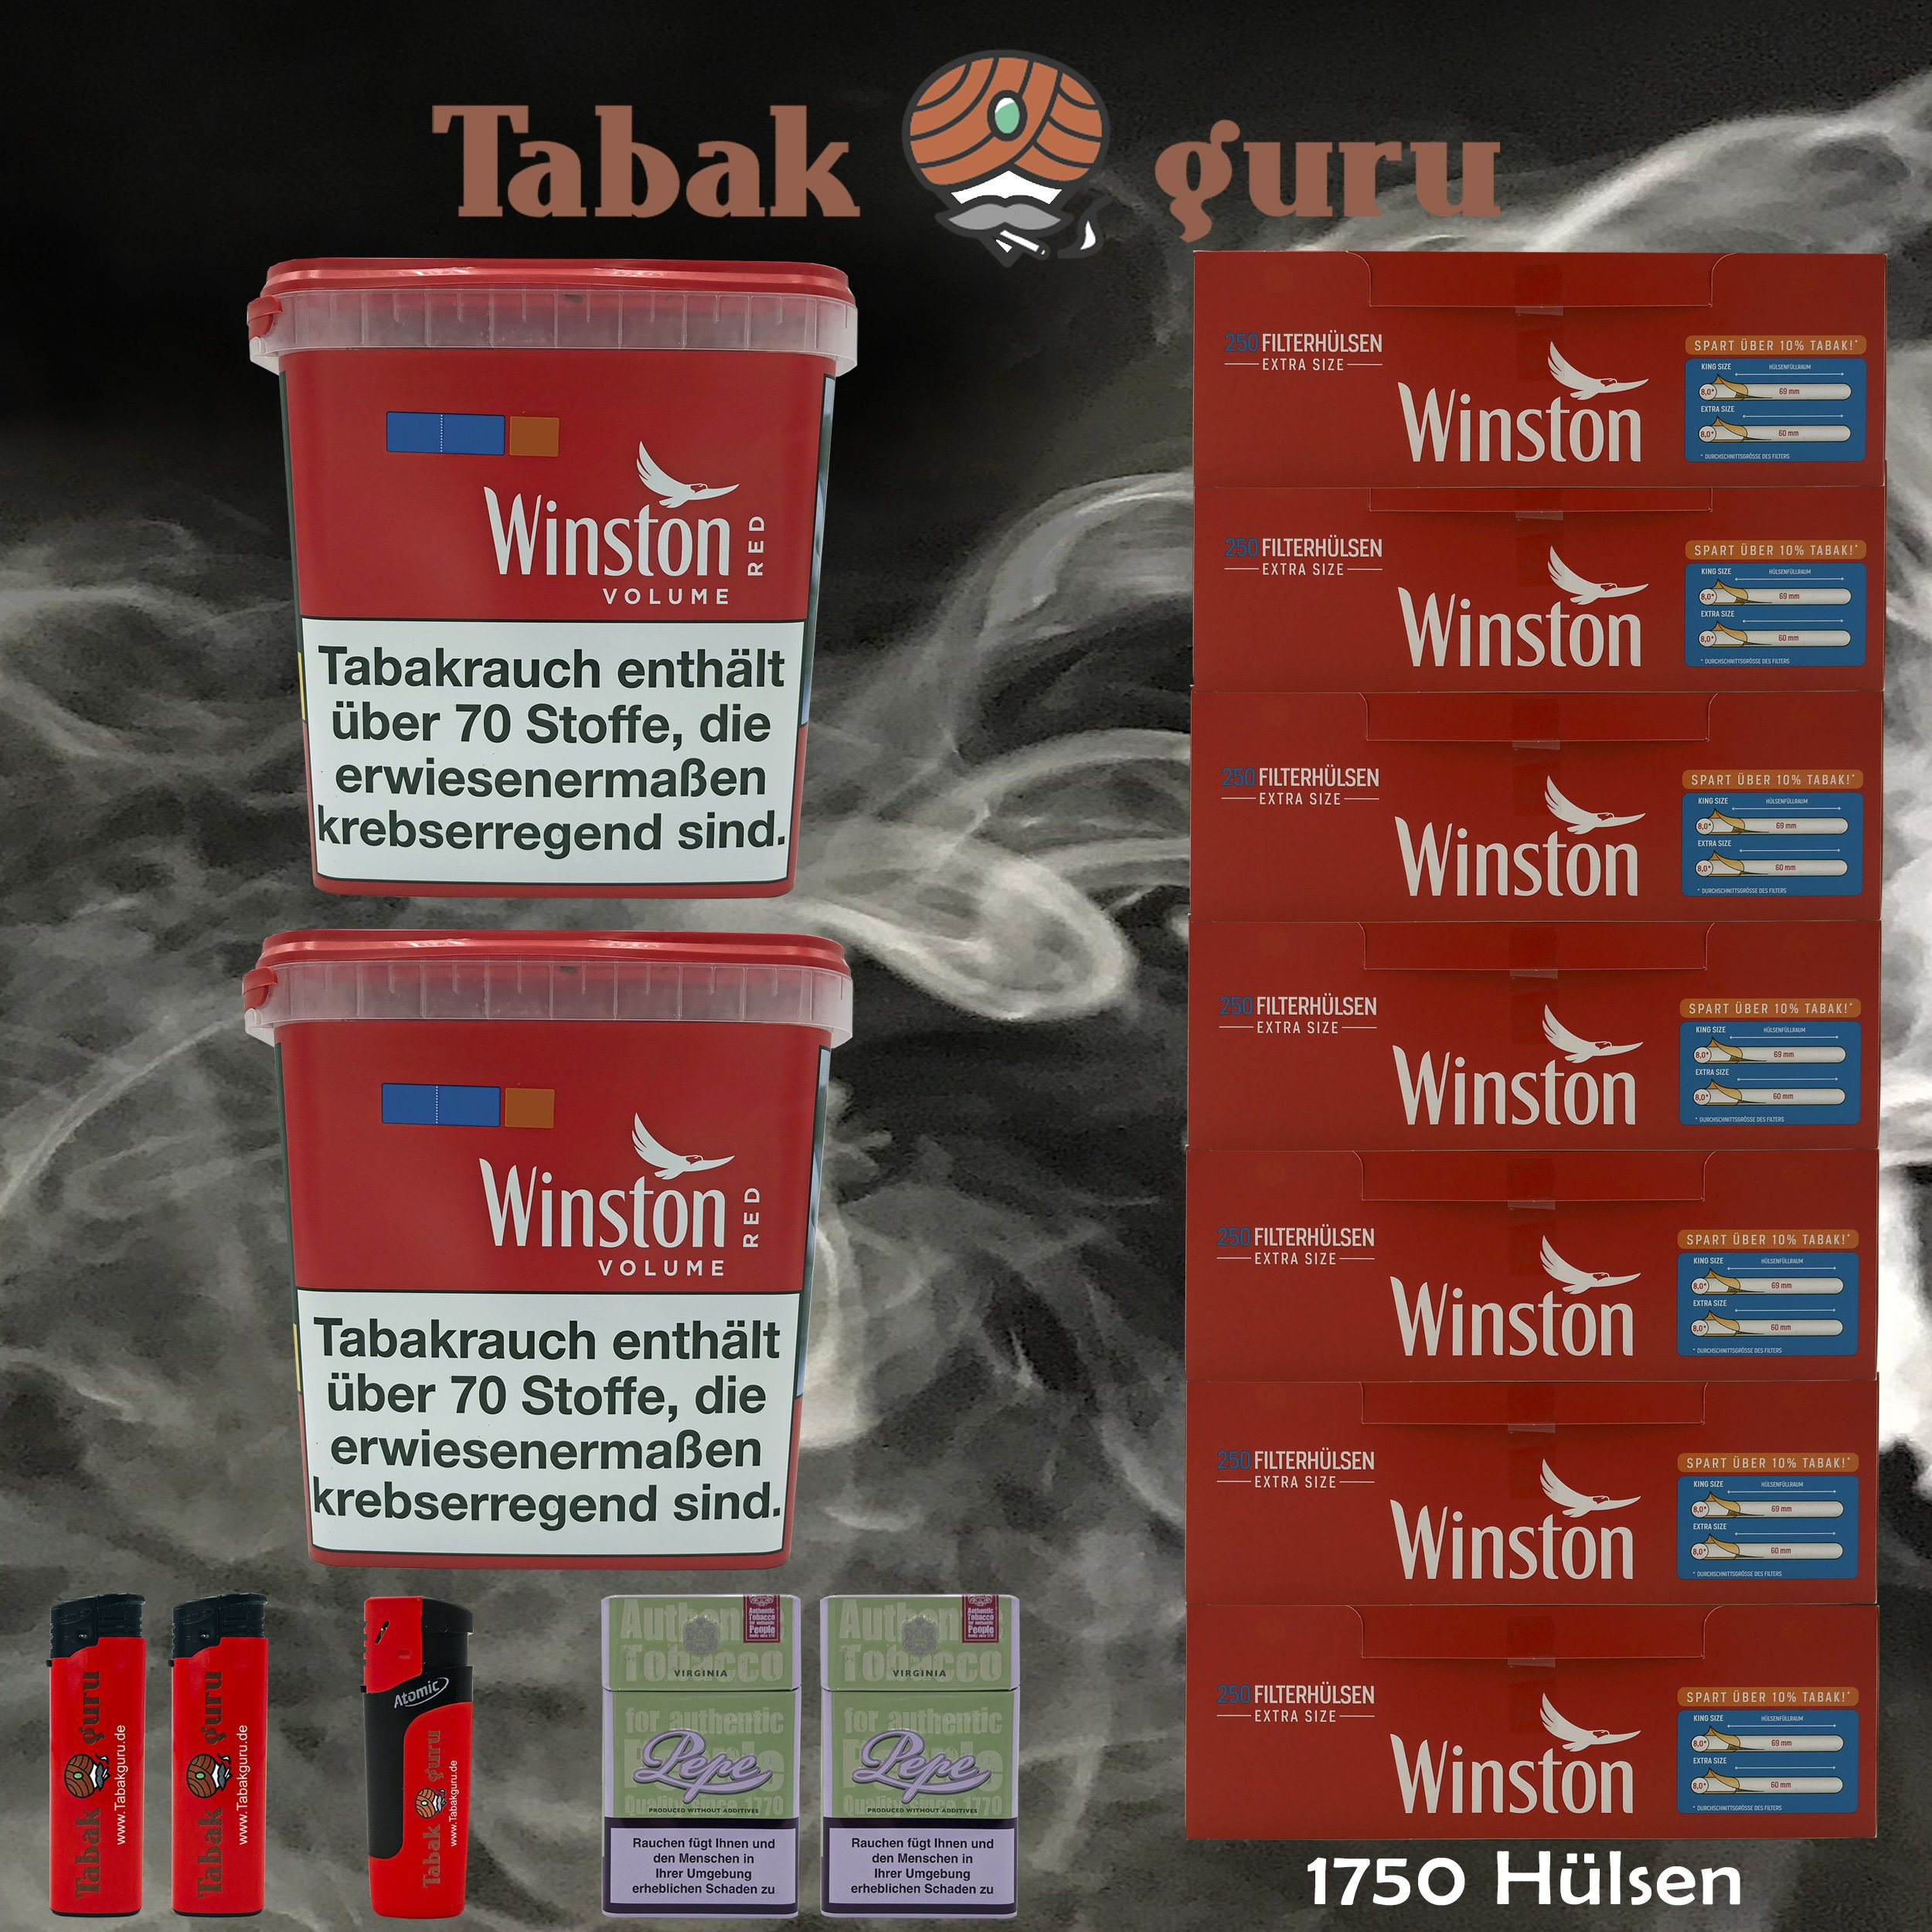 2x Winston Classic Red/Rot Giant Box 280g Volumentabak, 1750 Extra Hülsen, Zubehör